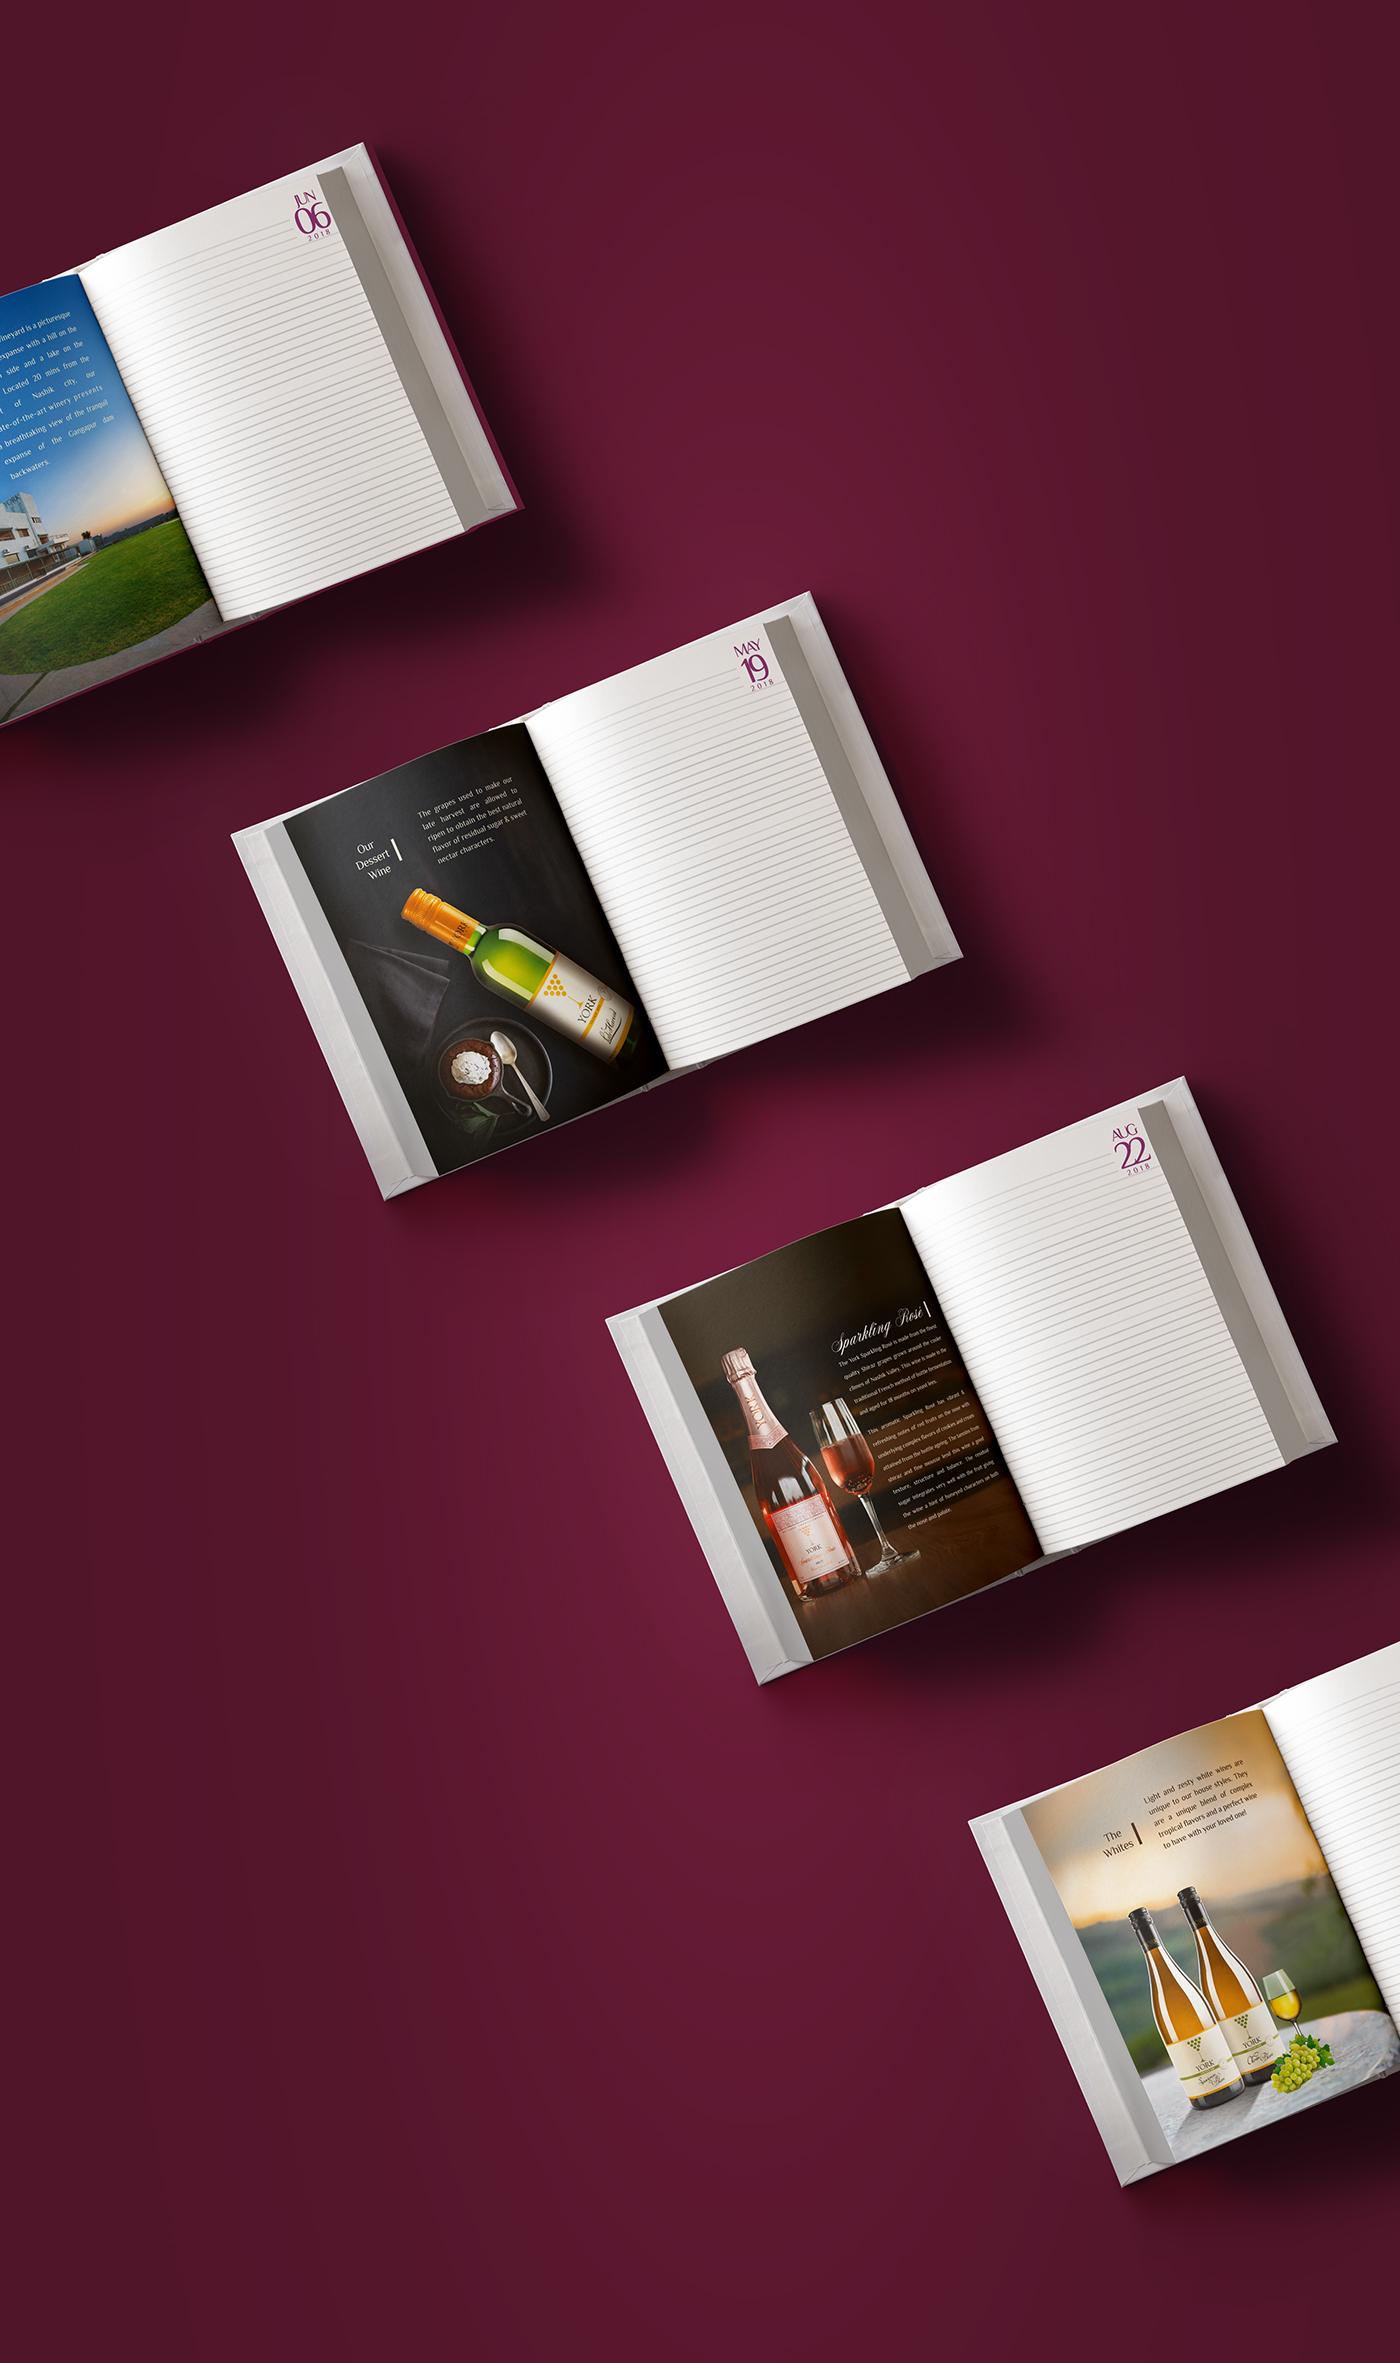 Yorkwinery,winery branding,winery diary,diary2018,WINEDIARY,Startup Farms